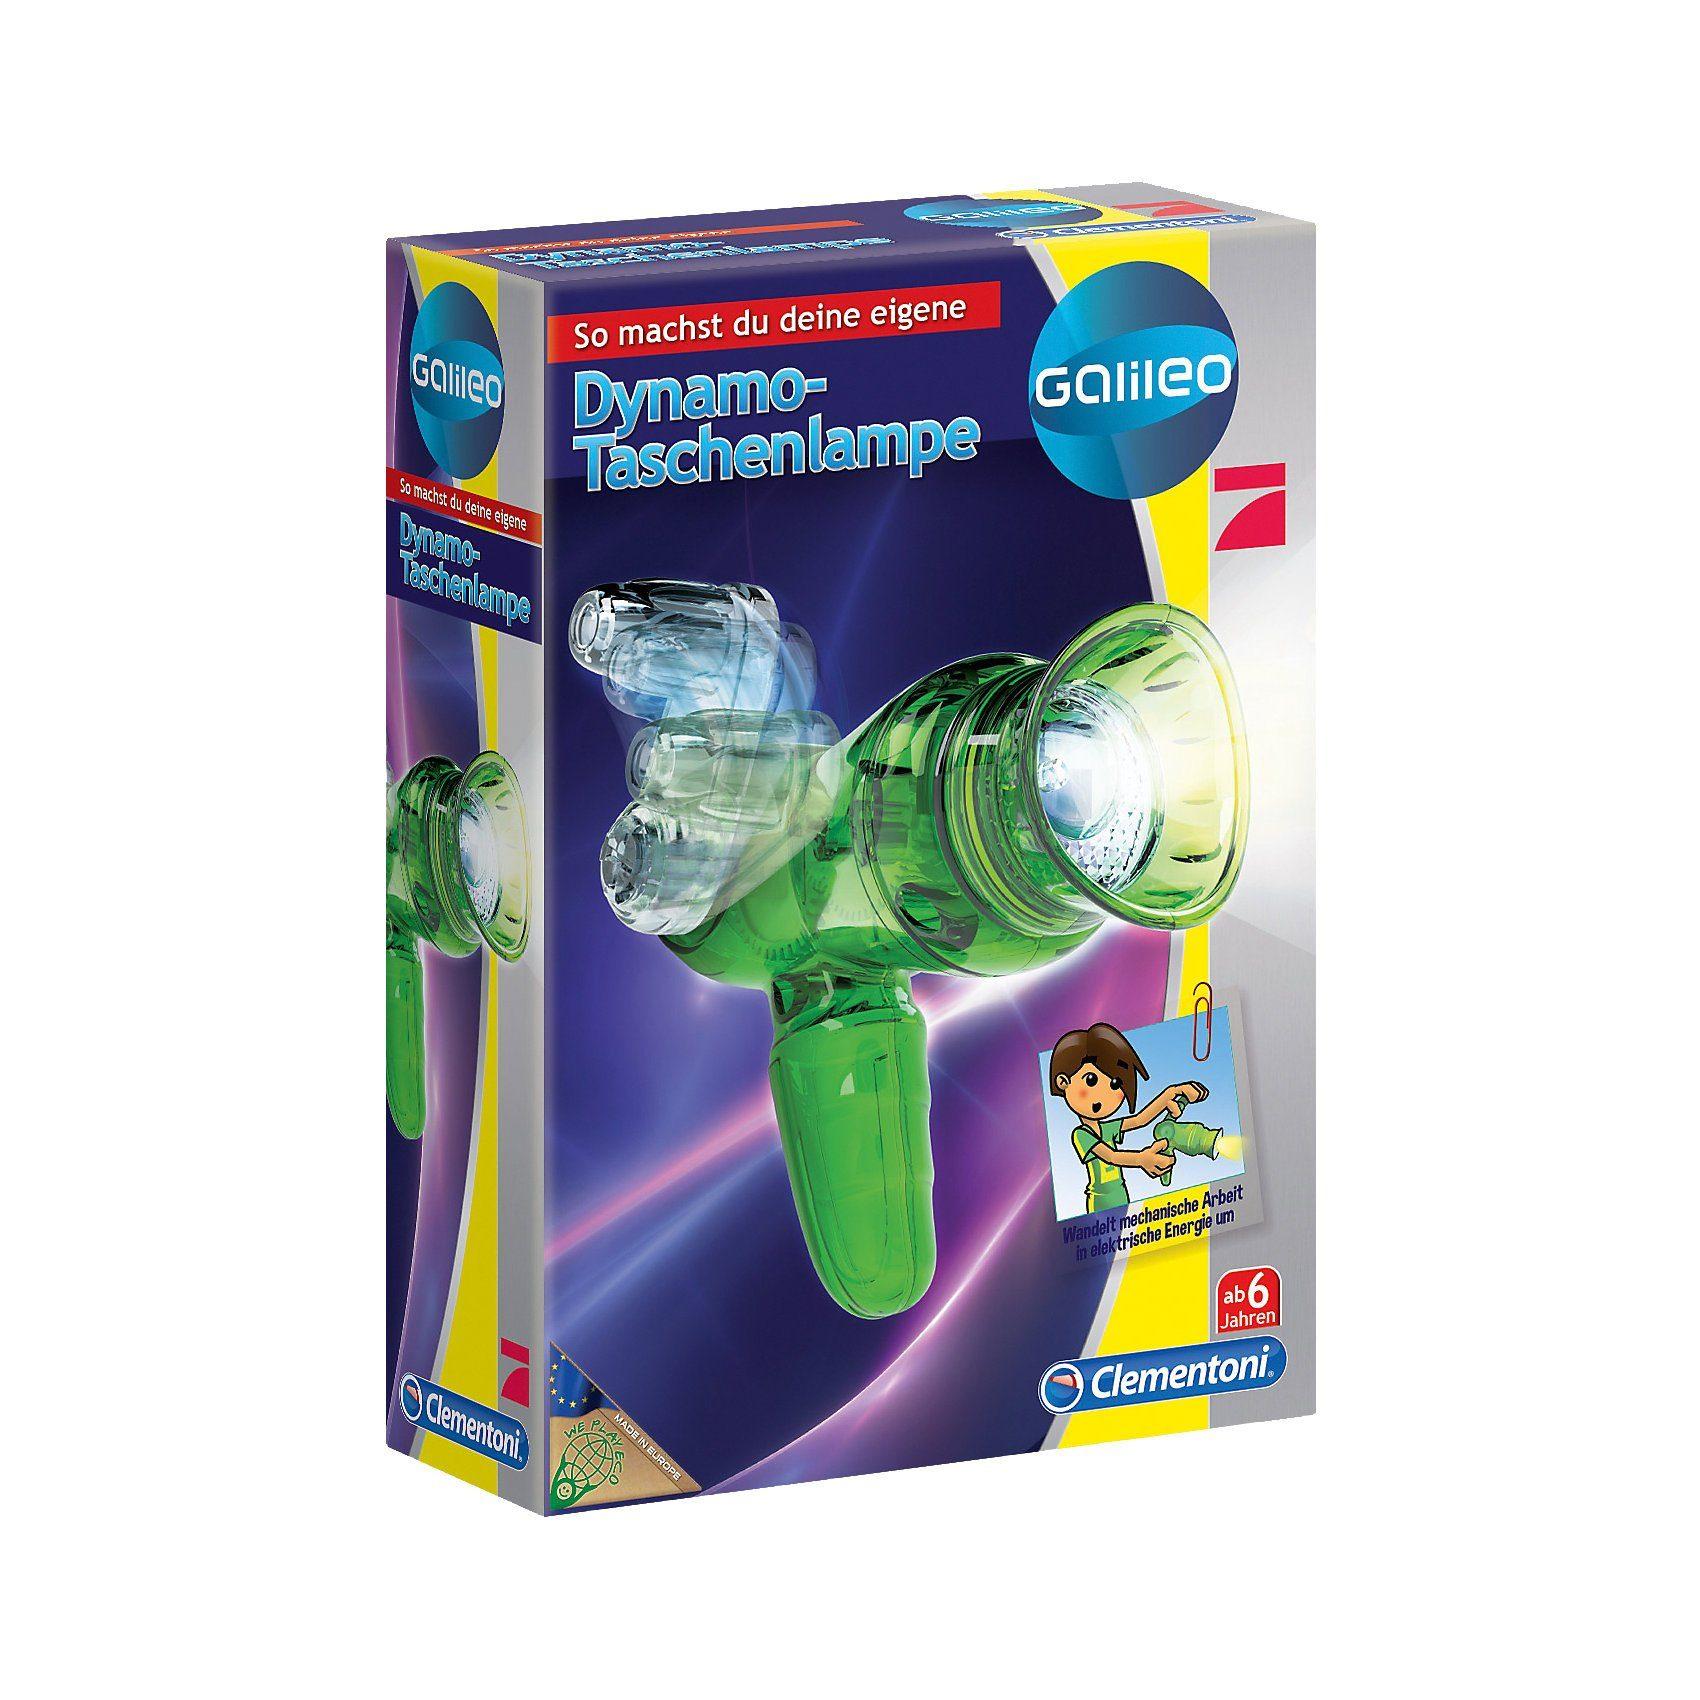 Clementoni® Galileo - Dynamo Taschenlampe